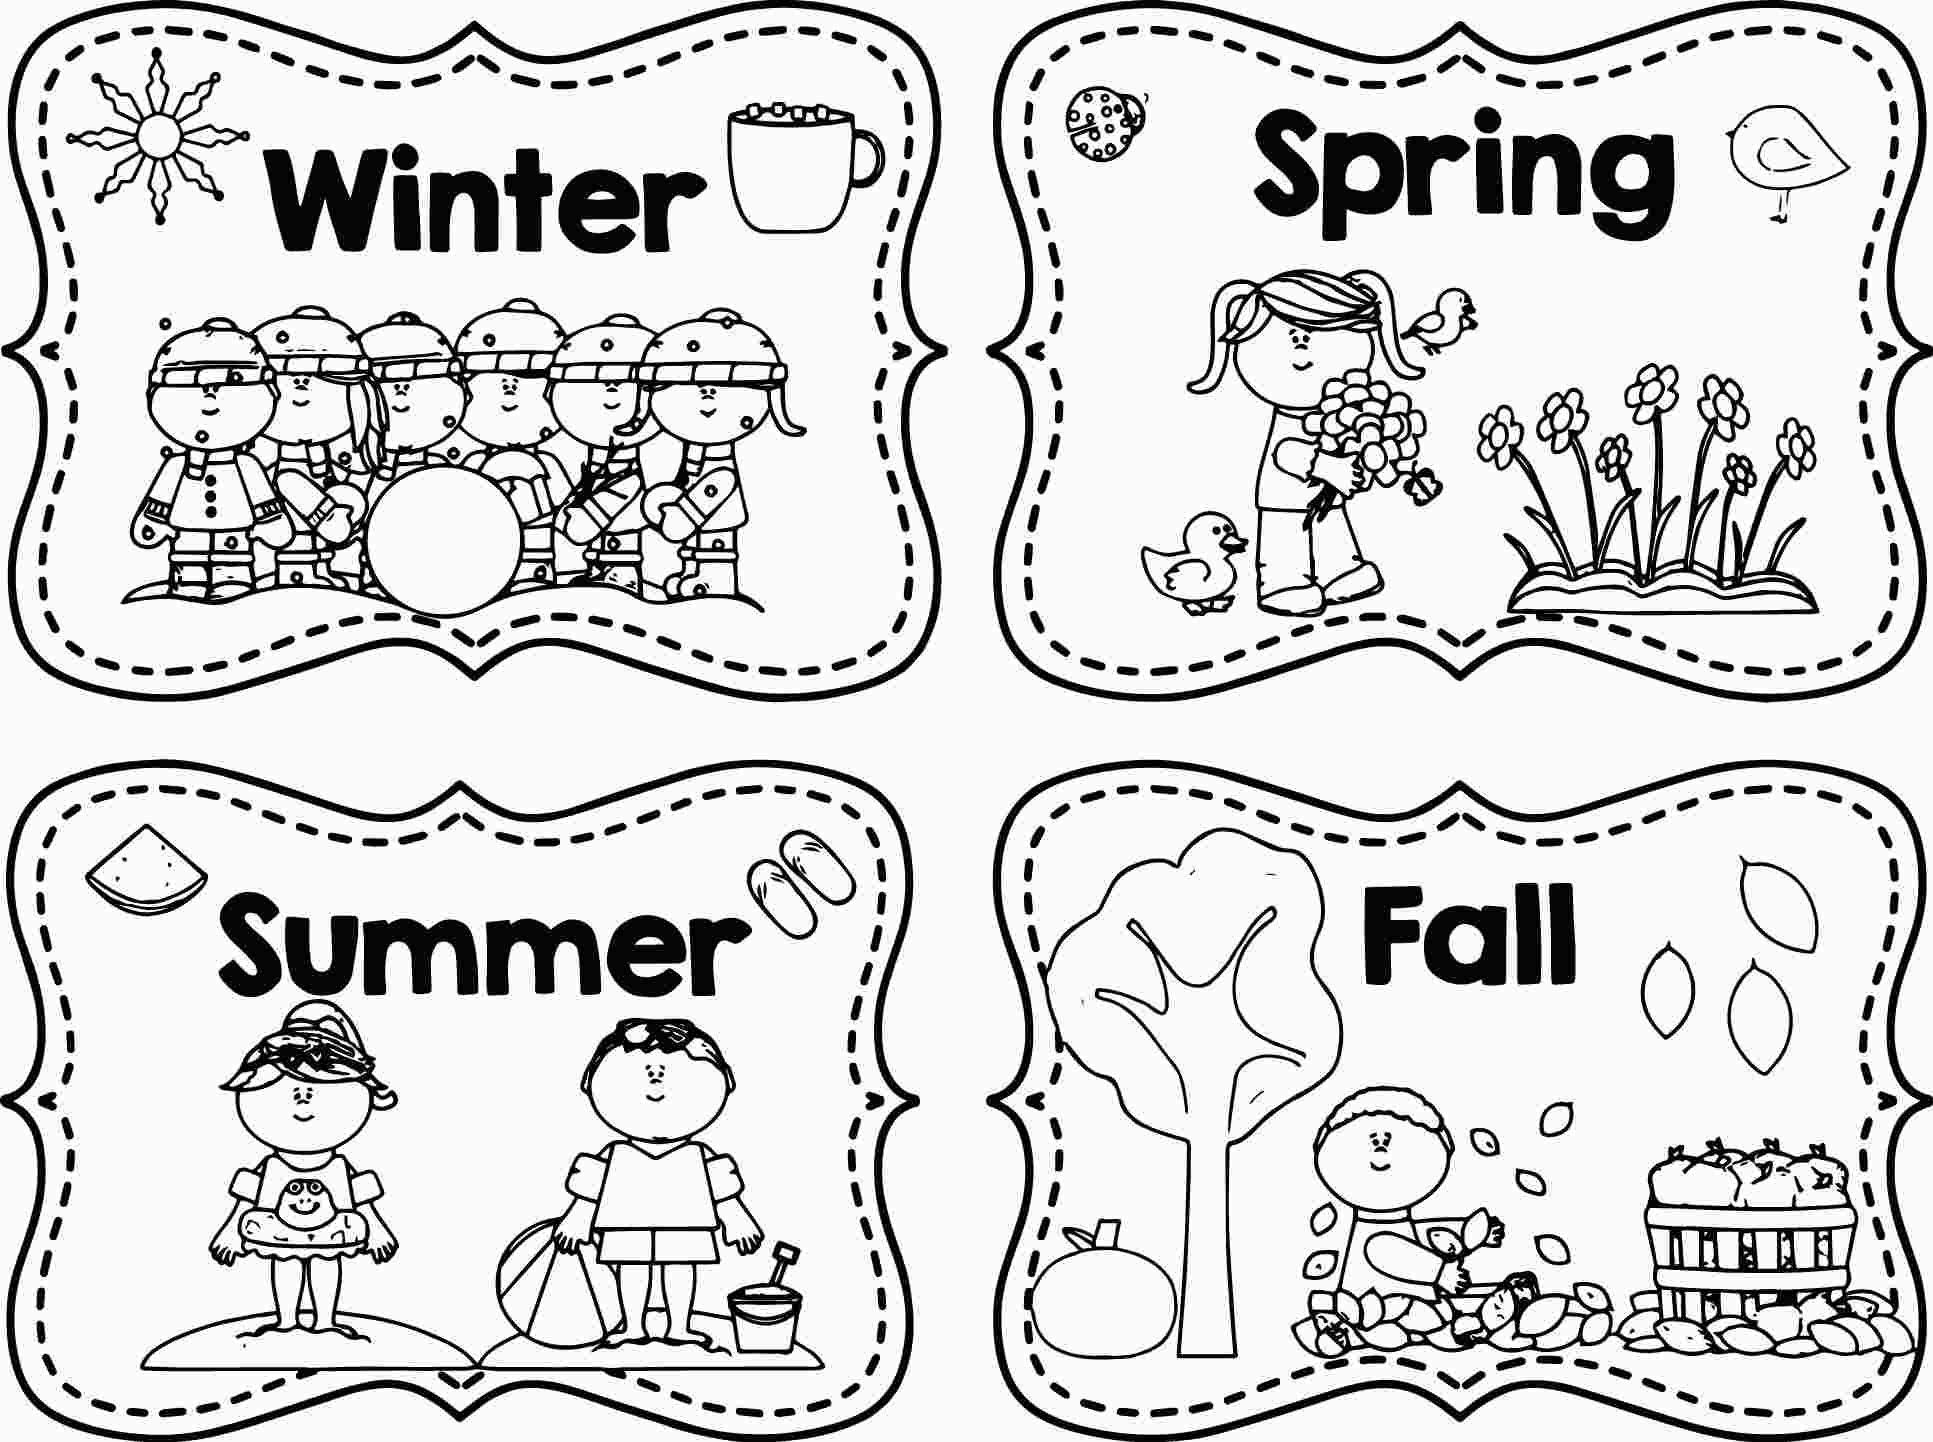 Printable 4 Seasons Coloring Page 4 Seasons Coloring Pages